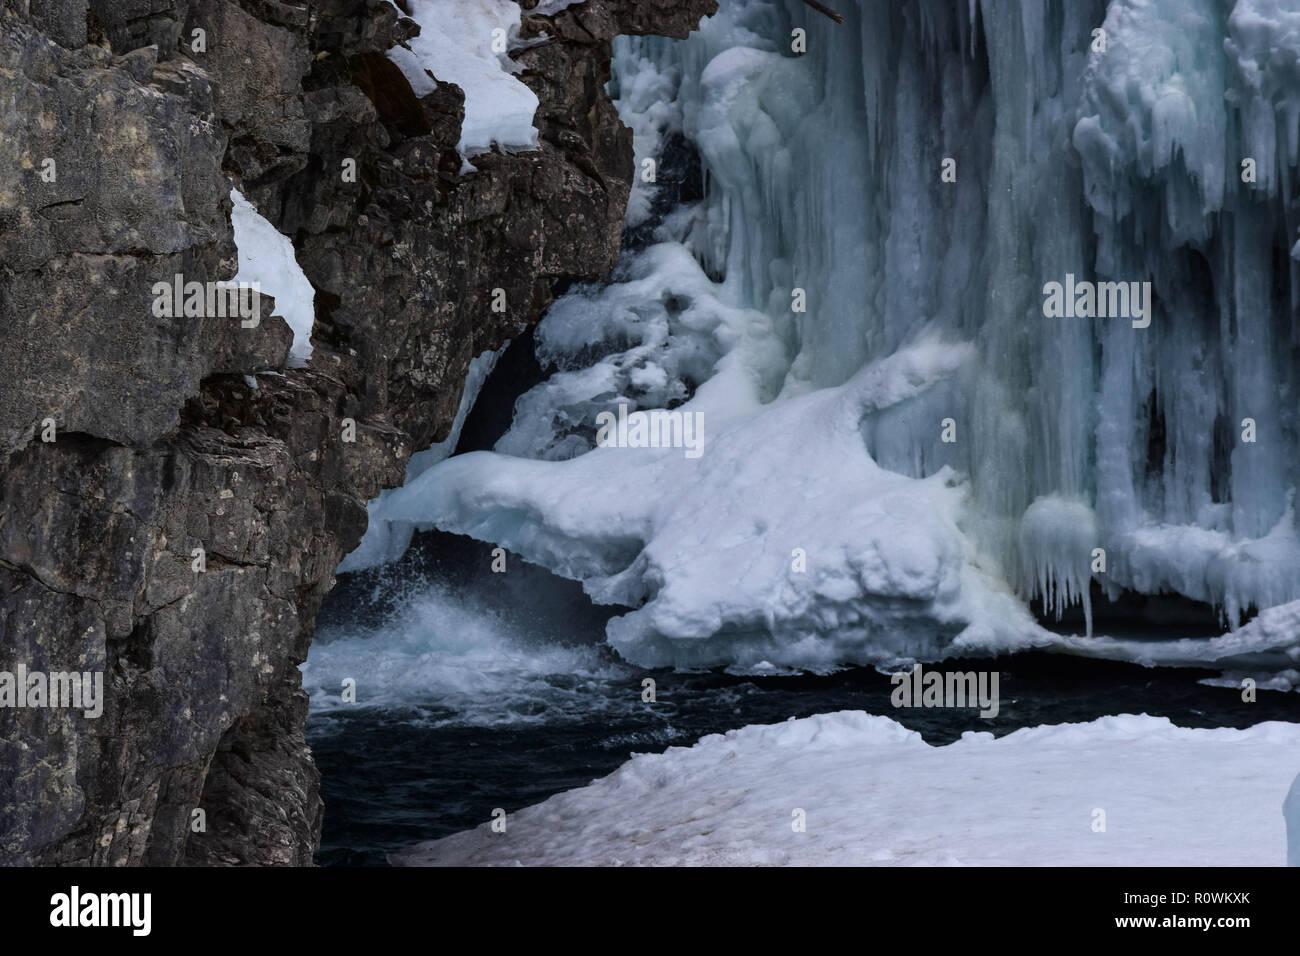 winter scenery in Alberta - Stock Image